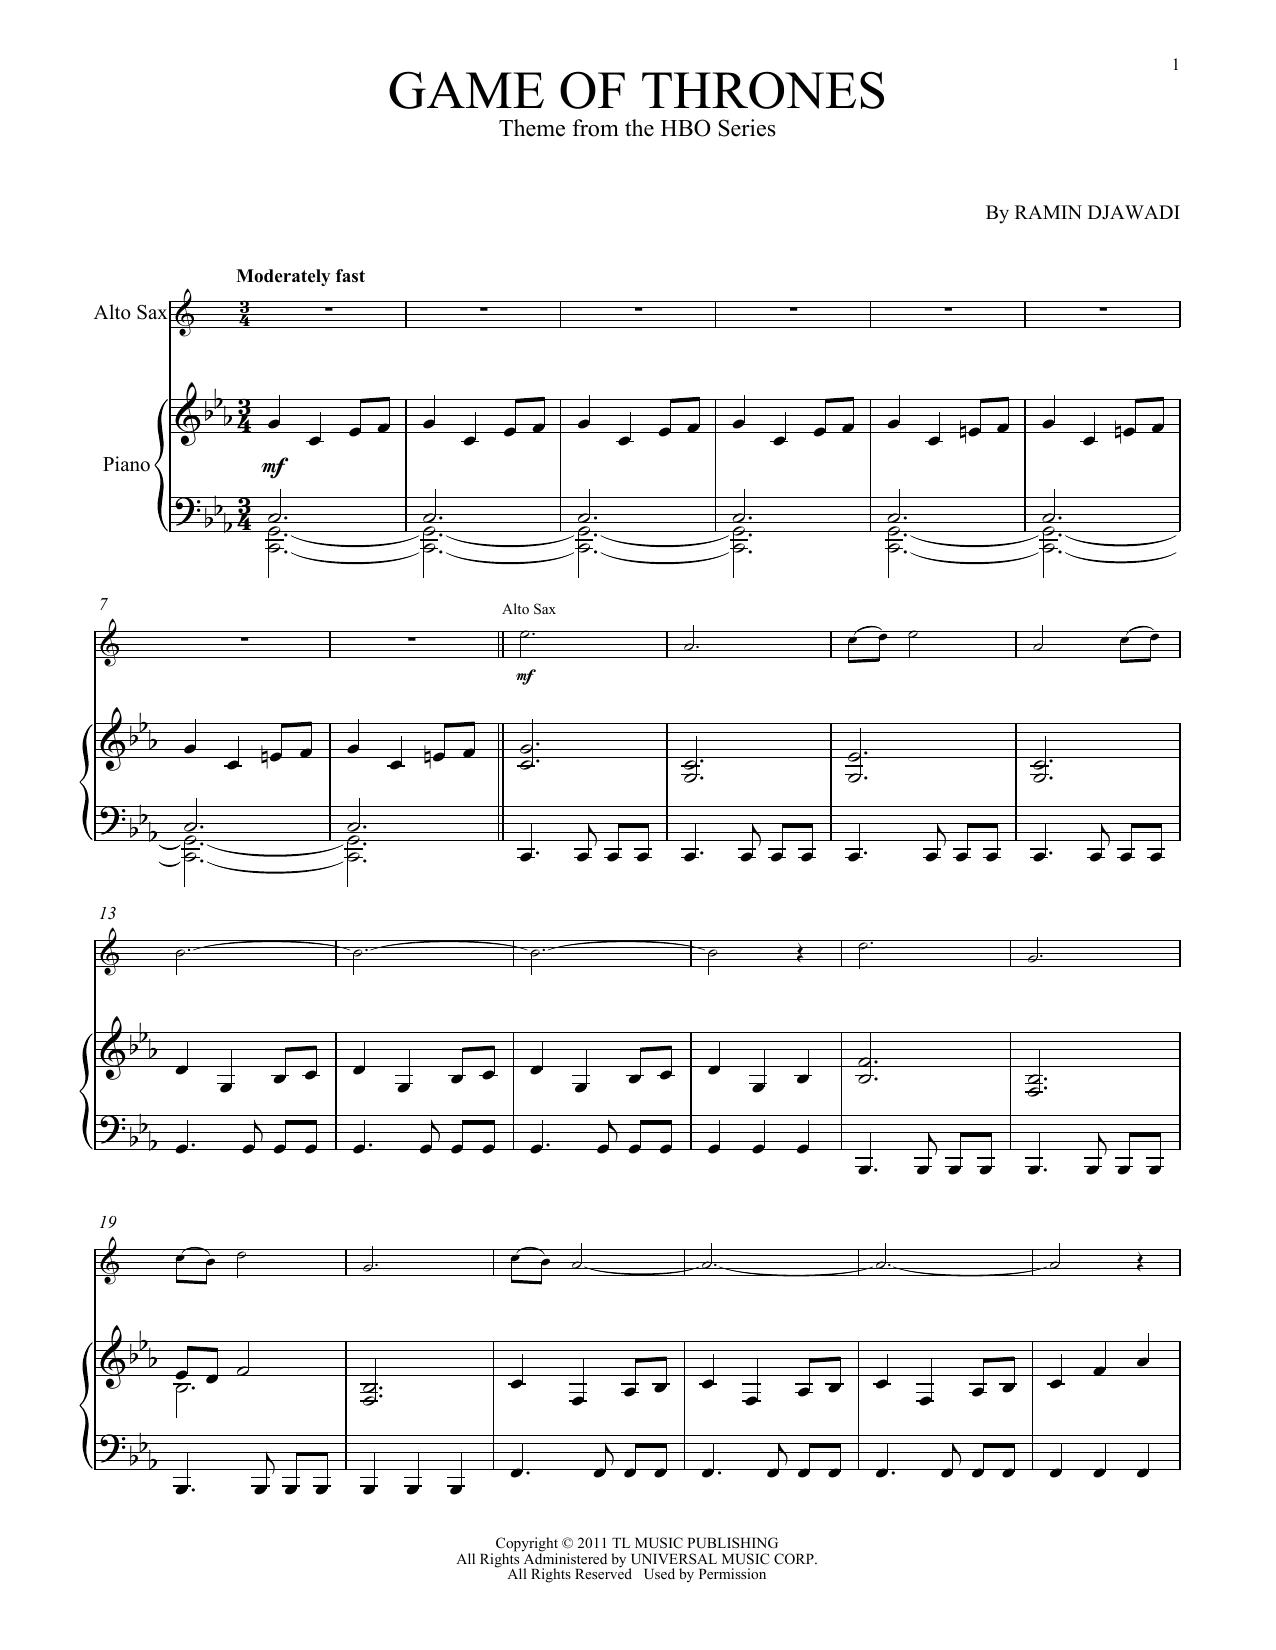 Game Of Thrones Titelmusik Klaviernoten game of thrones (alto sax and piano) - print sheet music now